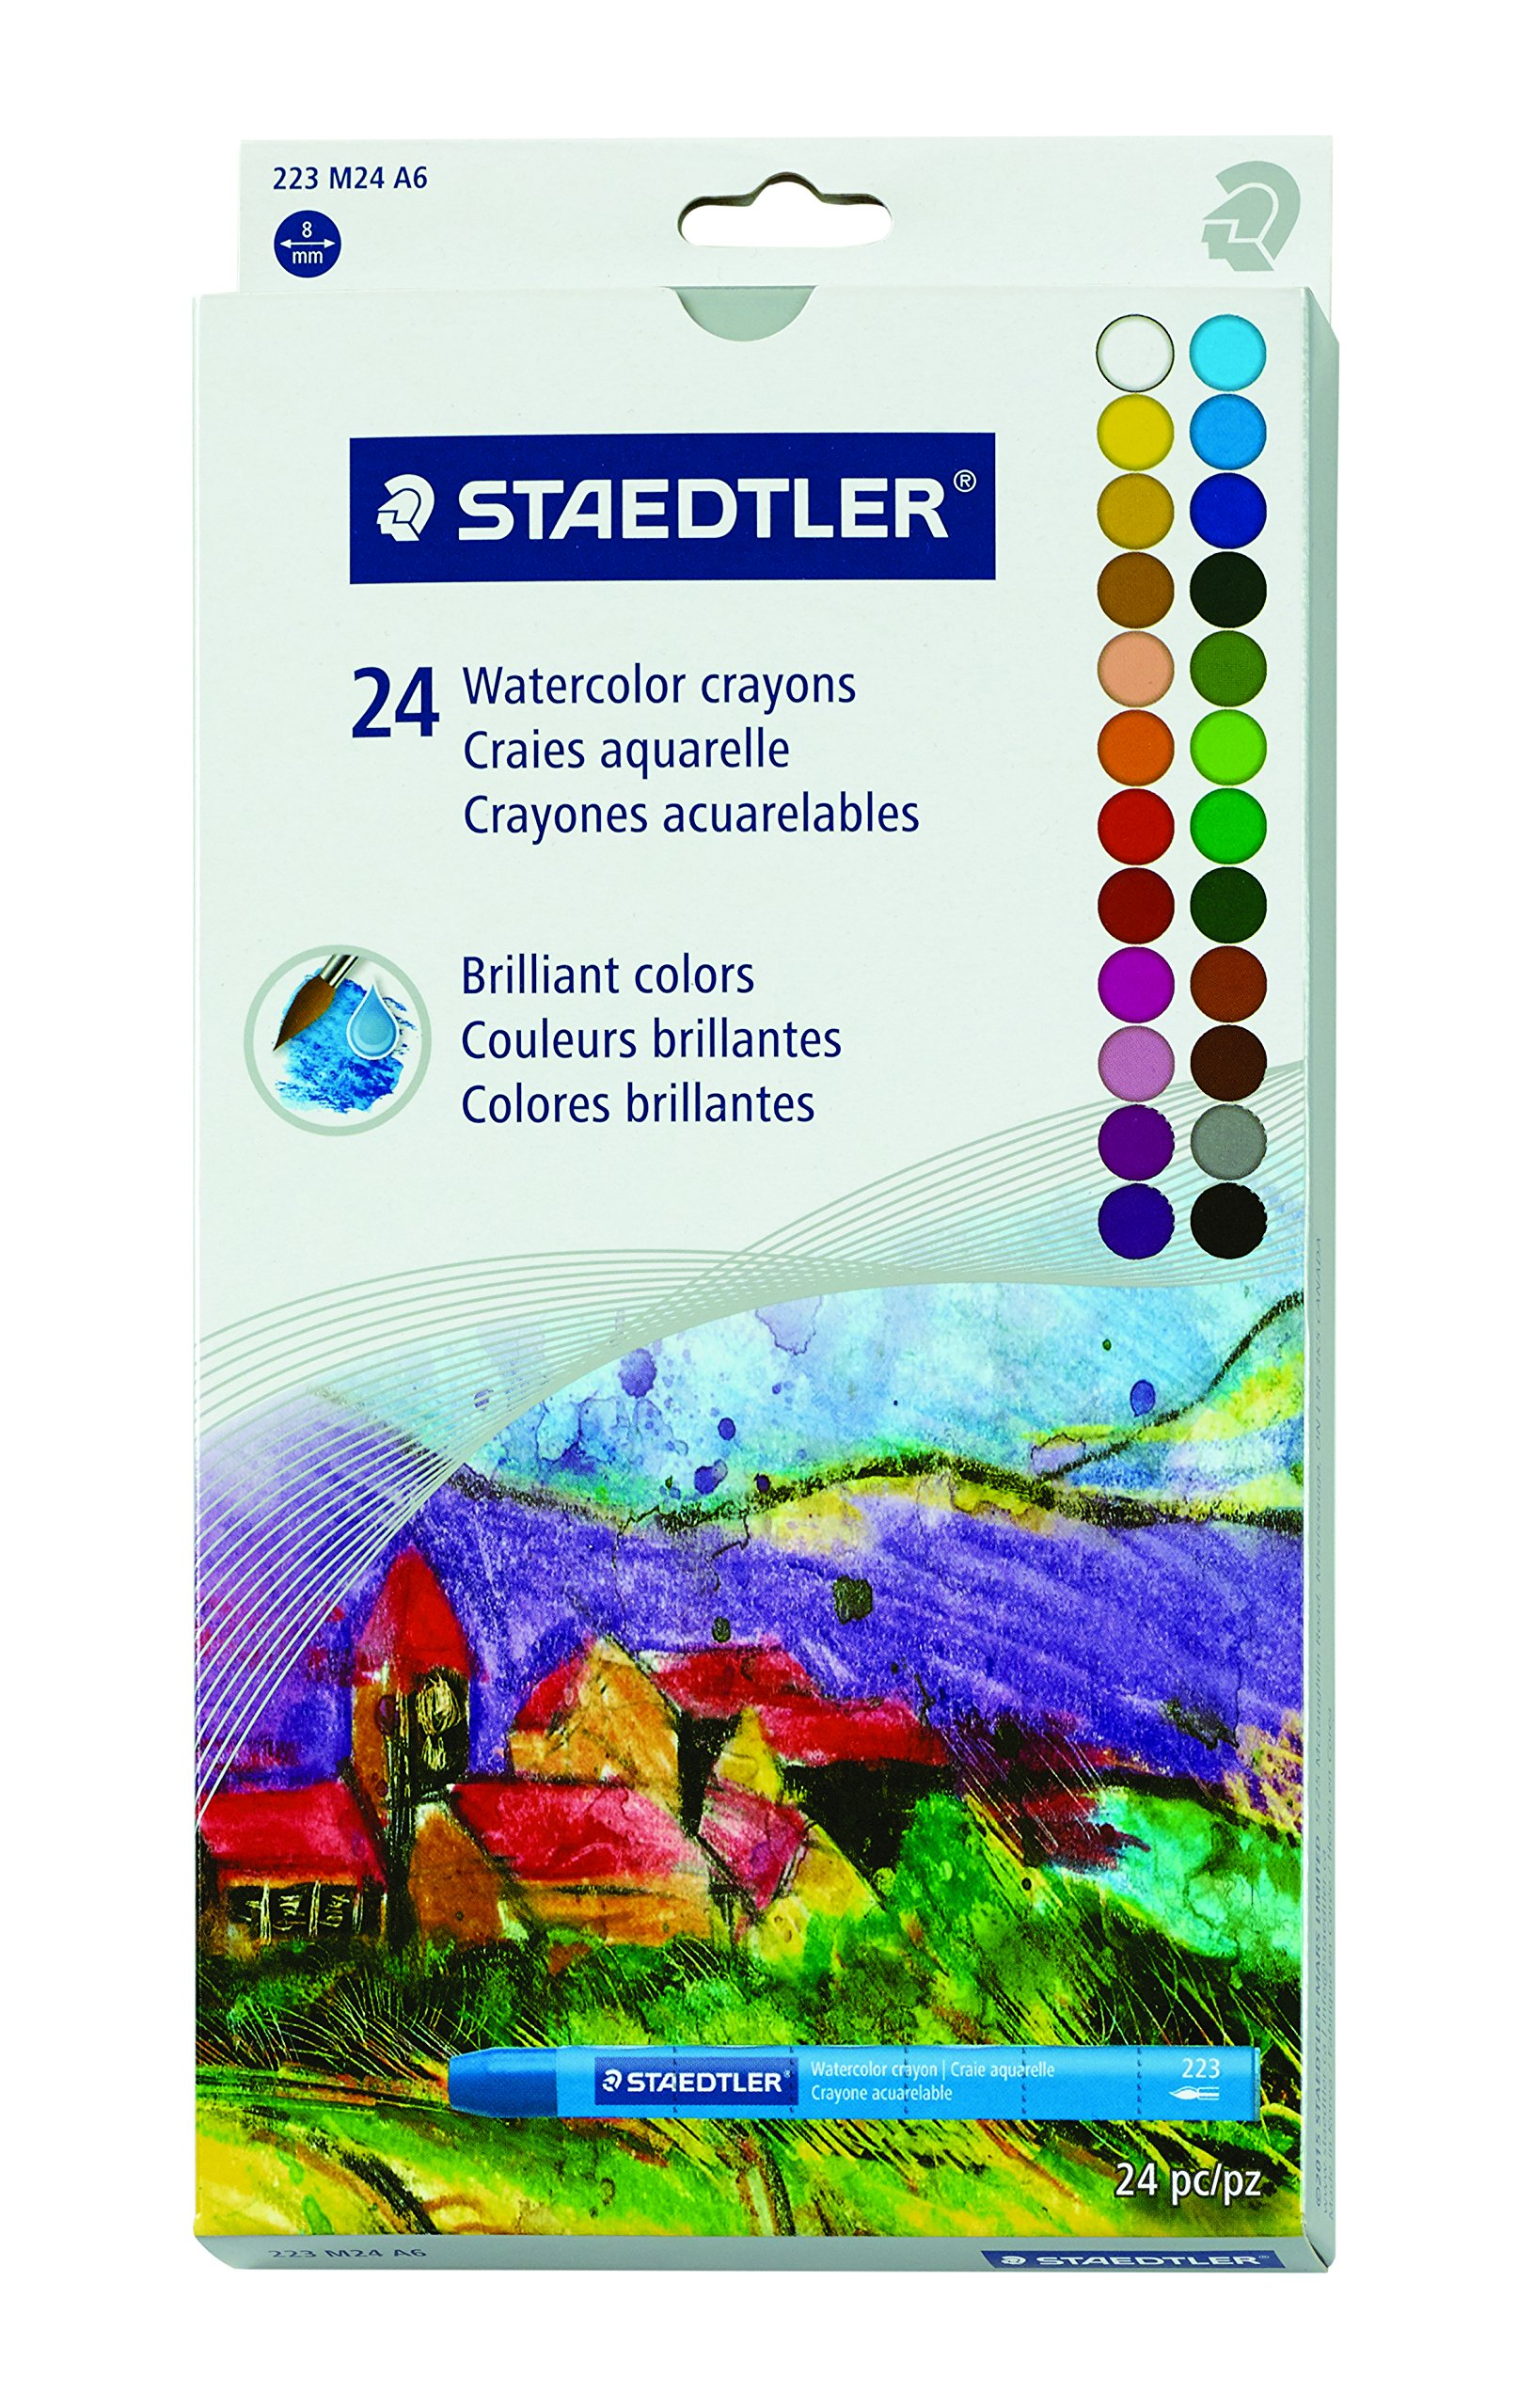 Staedtler Karat Aquarell Premium Watercolor Crayons (223M24) by STAEDTLER